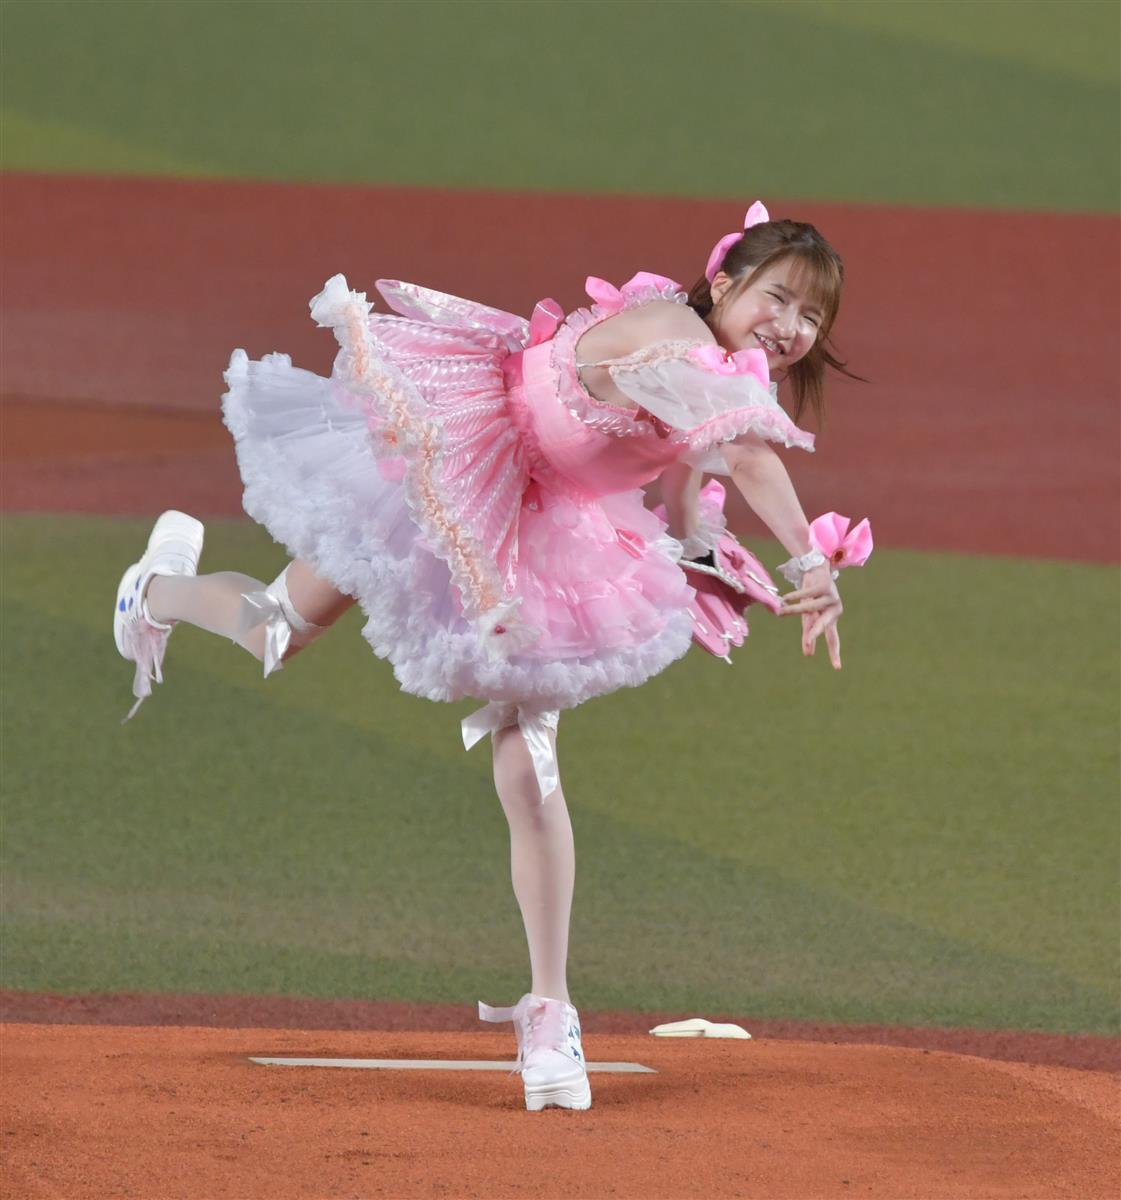 ZOZOマリンスタジアム 岩下 始球式 田村亮介 あずきに関連した画像-02